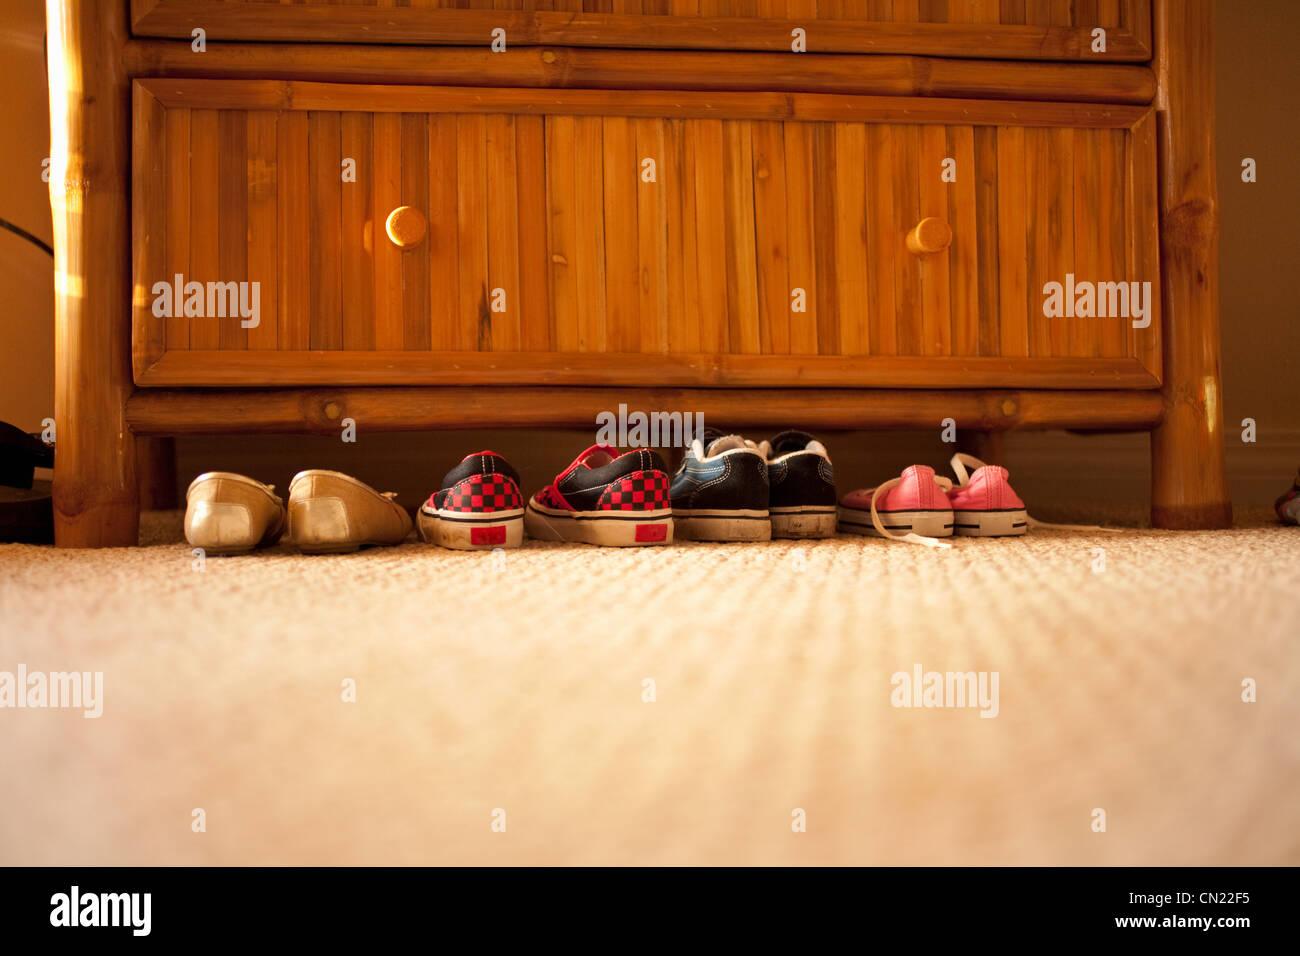 drawers stockfotos drawers bilder alamy. Black Bedroom Furniture Sets. Home Design Ideas